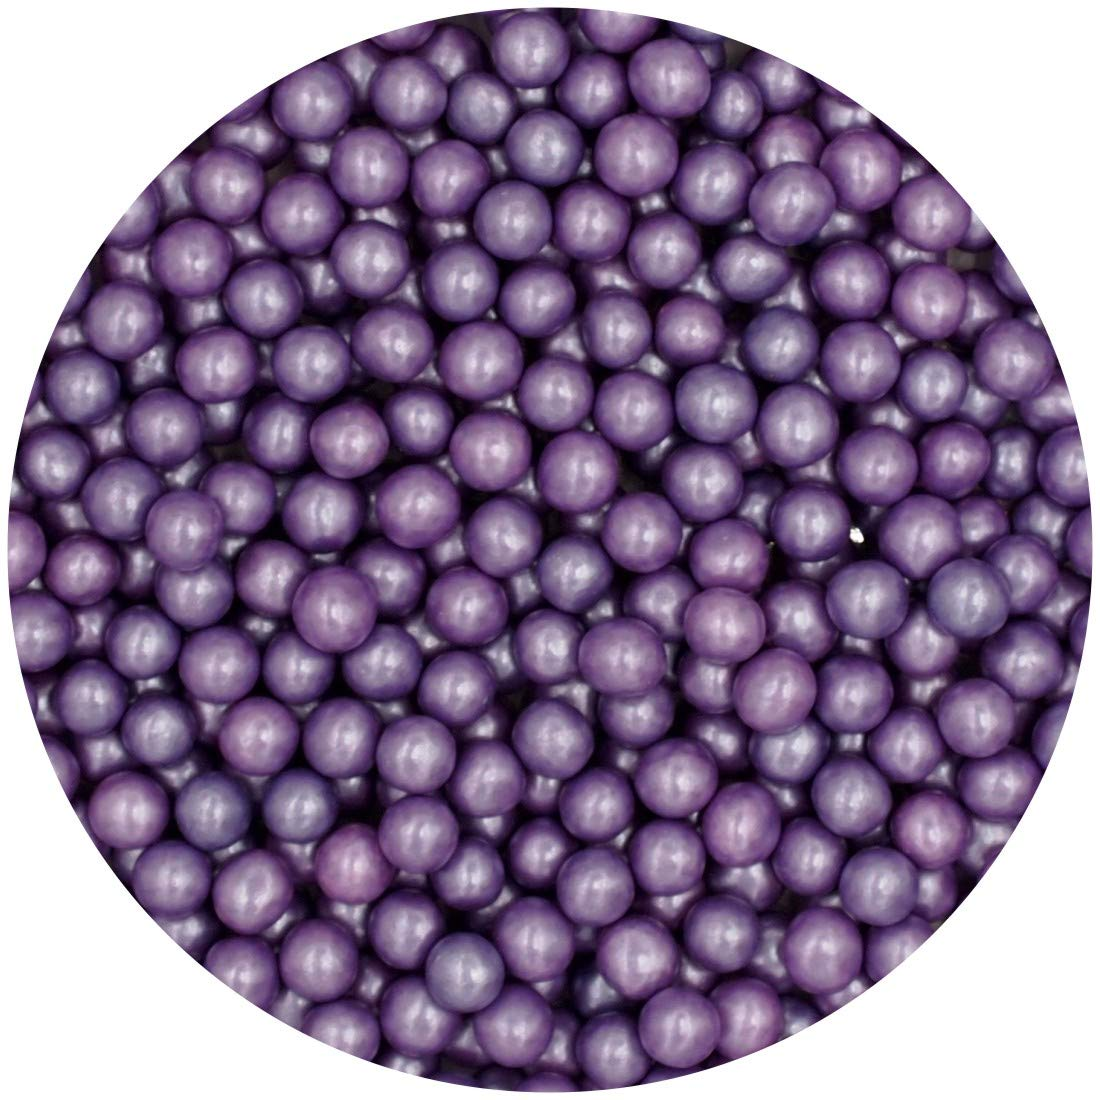 Natural6mmPurpleNuts Dairy Soy Gluten GMO Freeshimmer Pearls Bulk Pack